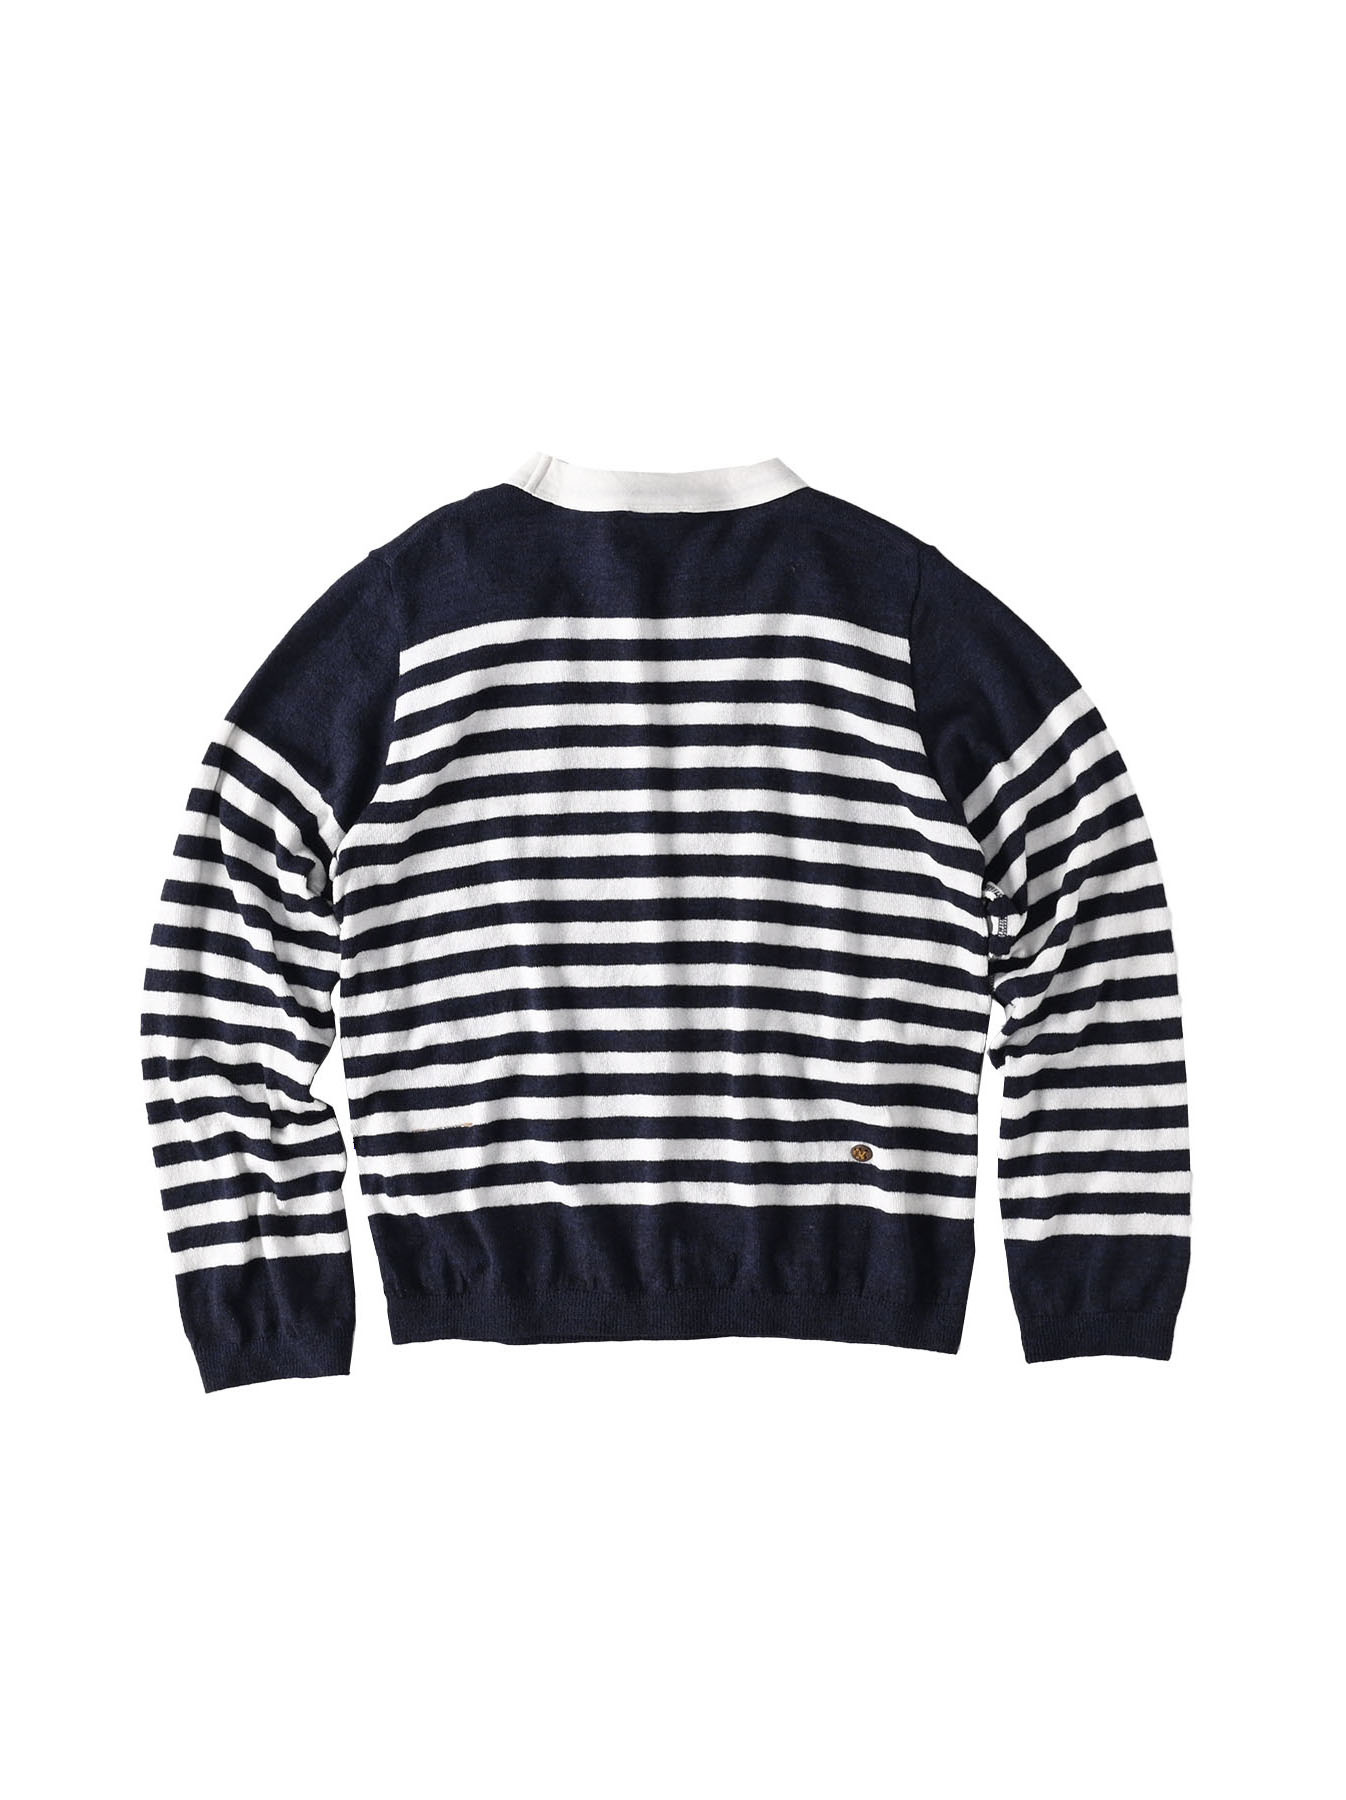 Super Gauze 908 Basque T-shirt Made in Japan (0621)-7